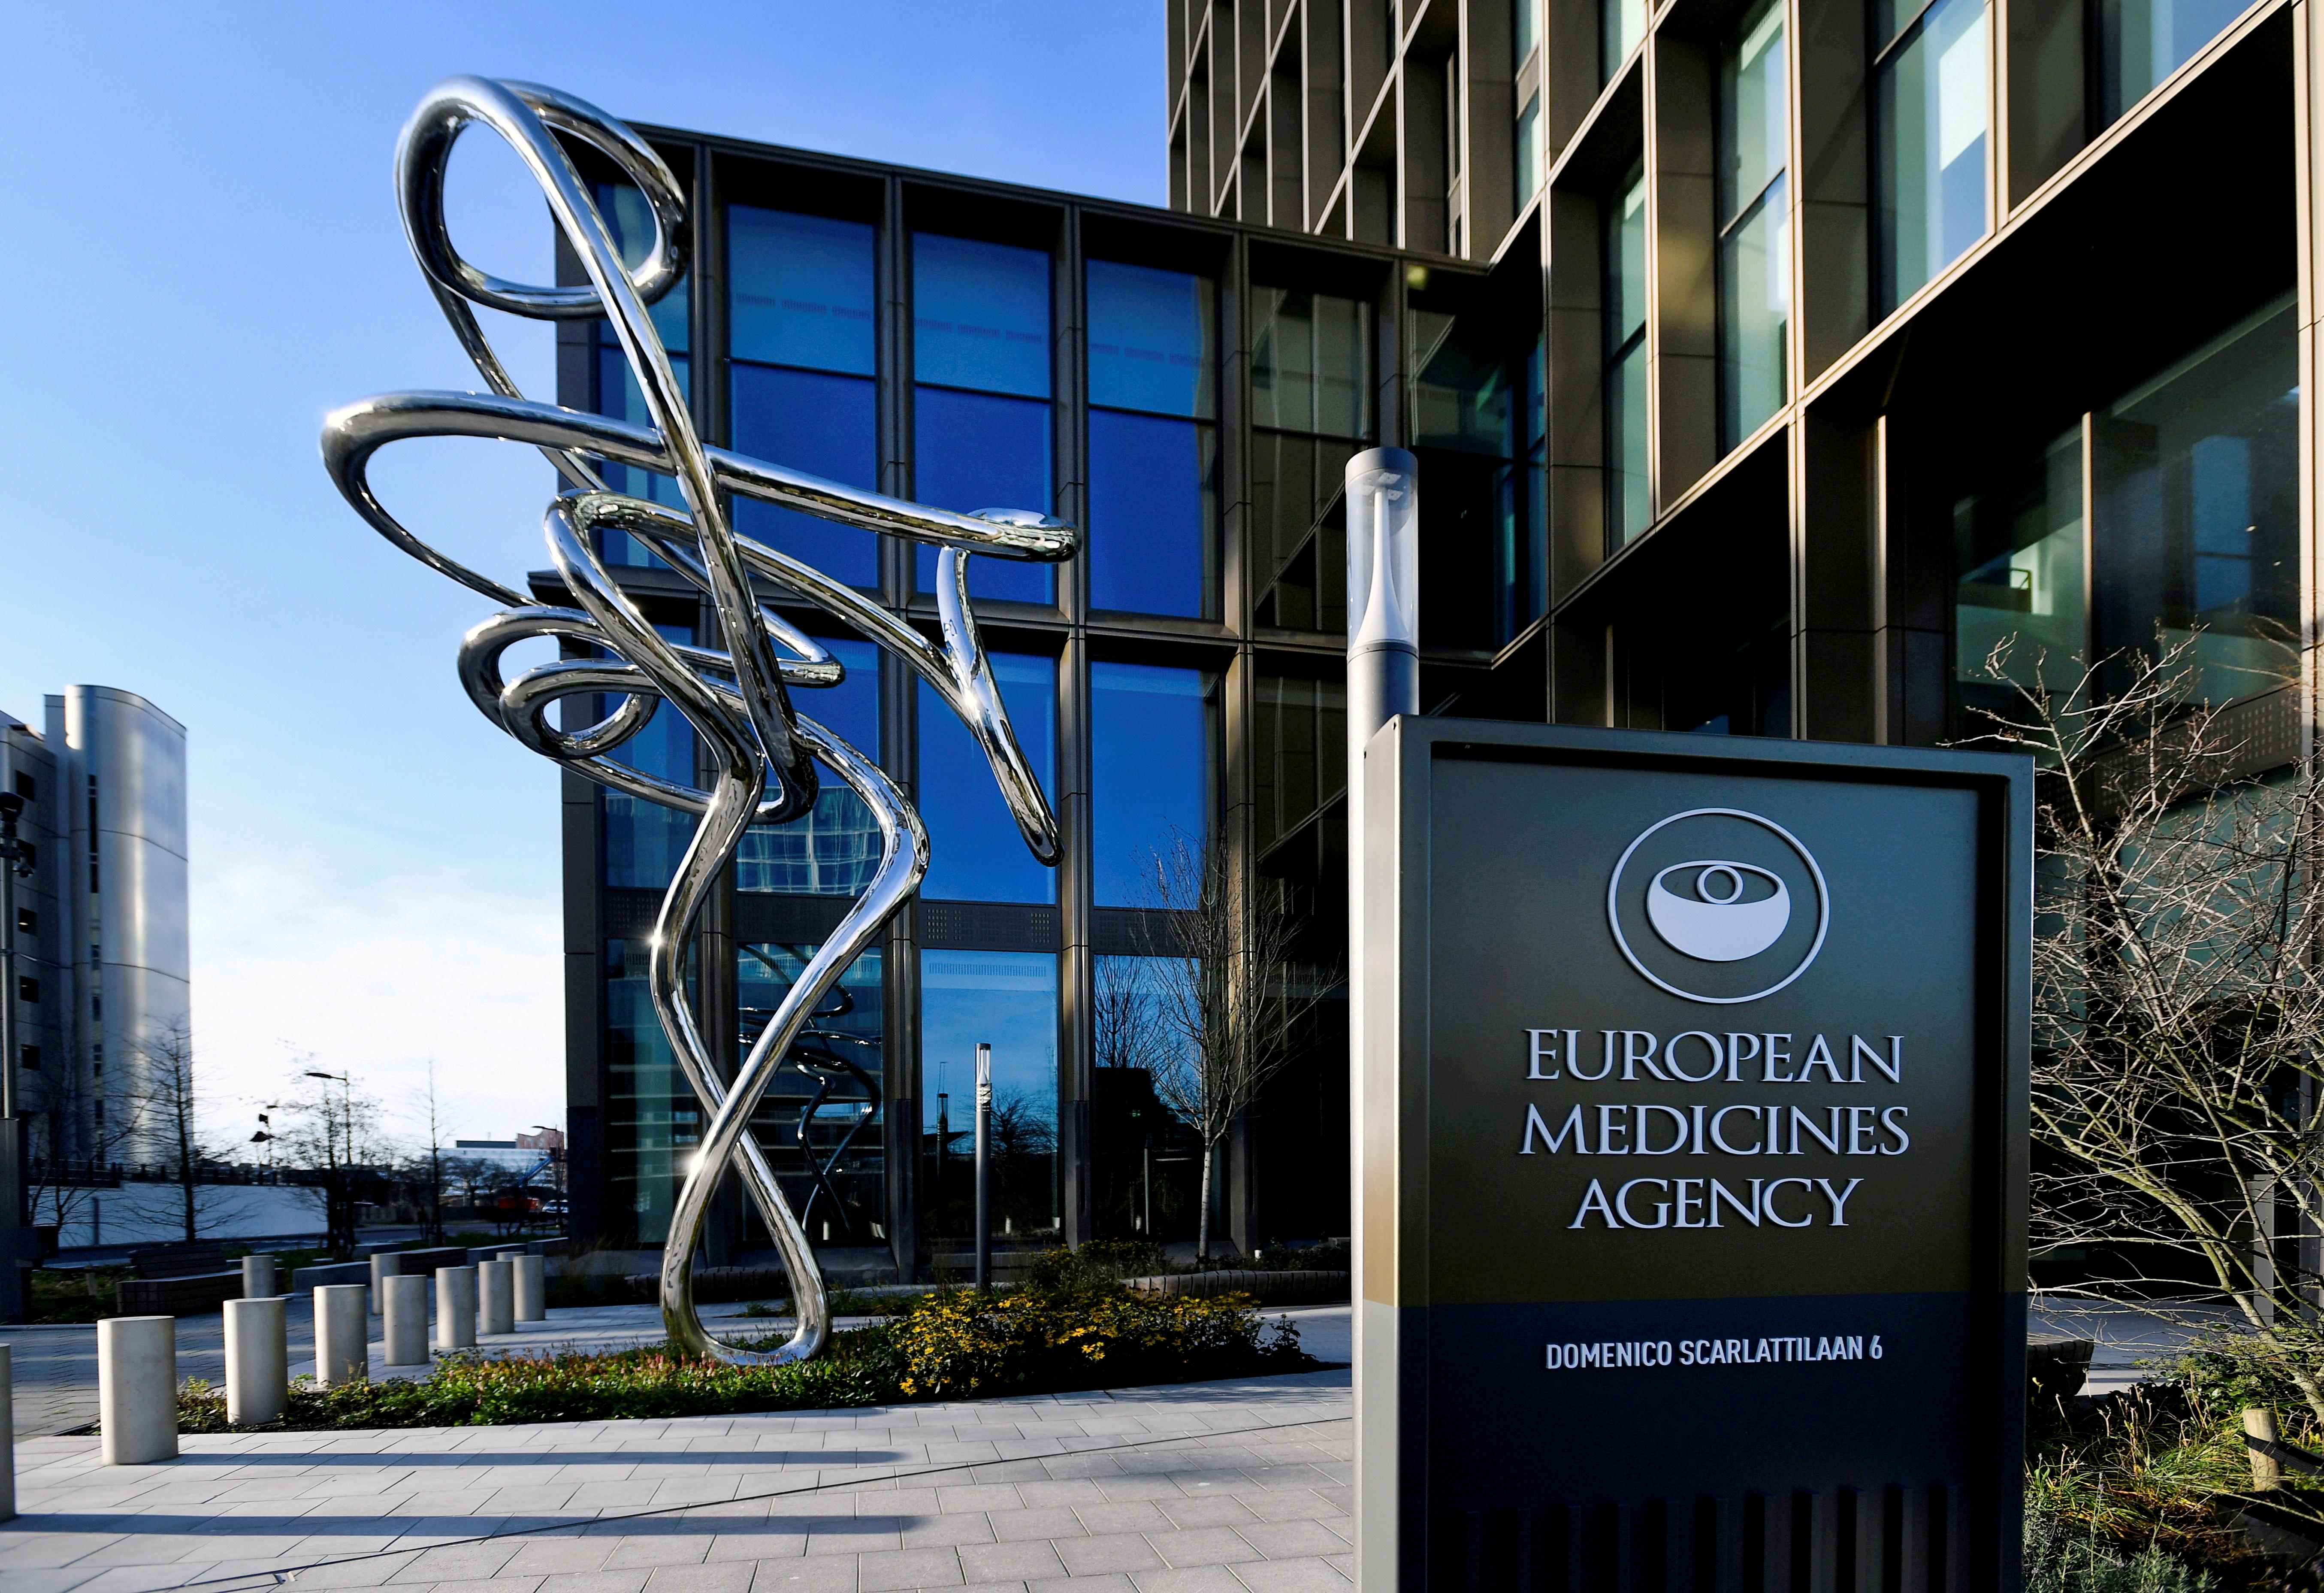 The exterior of the European Medicines Agency is seen in Amsterdam, Netherlands, December 18, 2020. REUTERS/Piroschka van de Wouw/File Photo